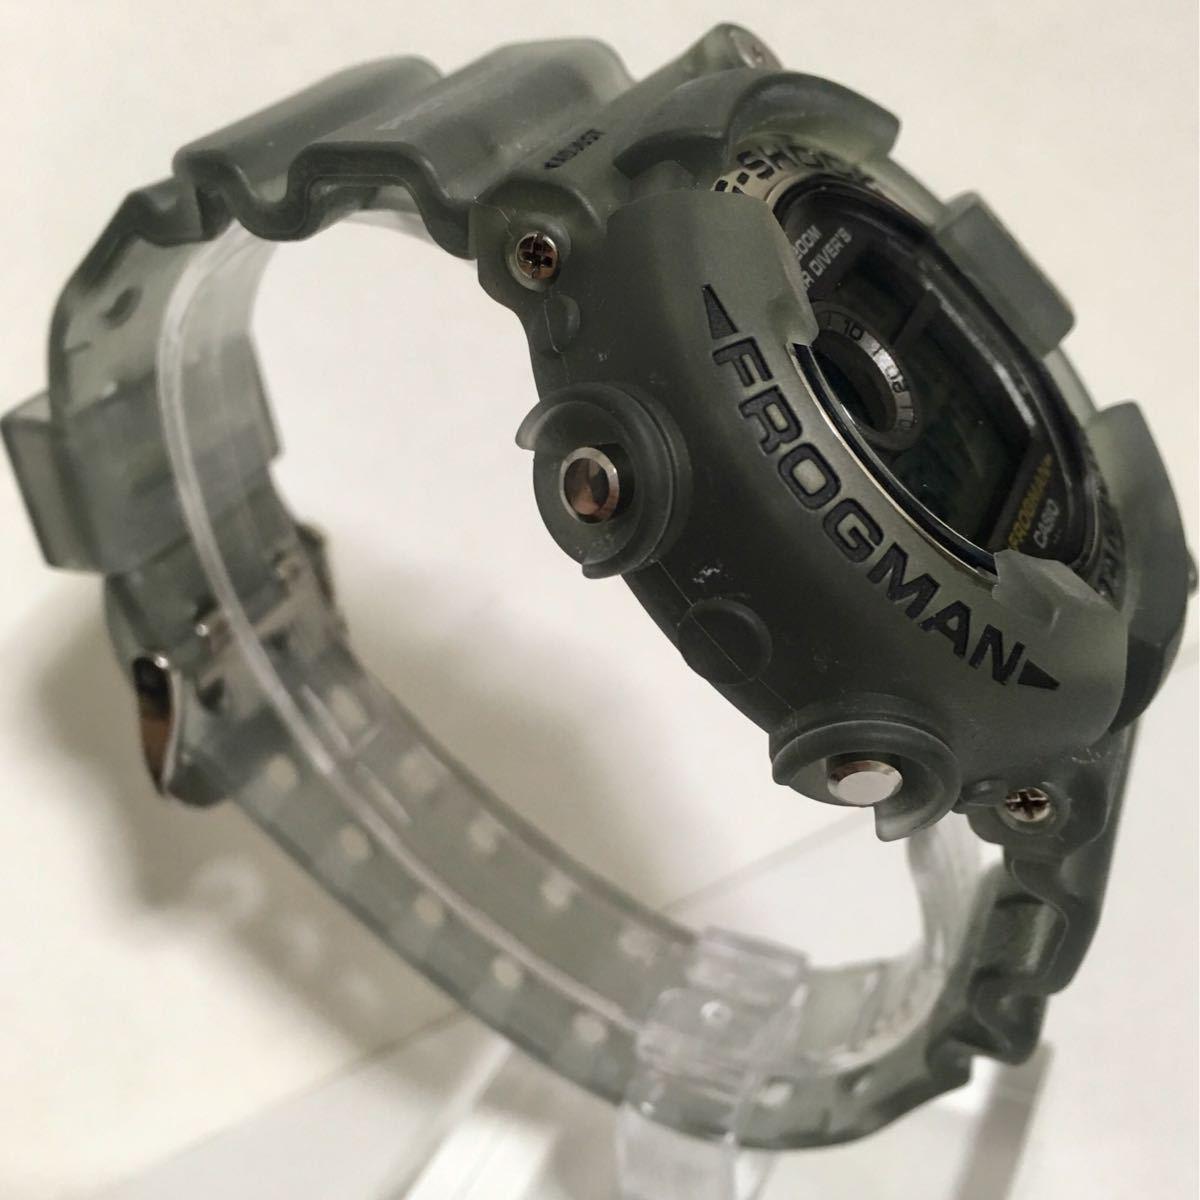 CASIO G-SHOCK DW-8200MS-8T 未使用 美品 FROGMAN フロッグマン MEN IN SMOKE メン・イン・スモーク 潜水蛙 箱タグ付き Gショック_画像6